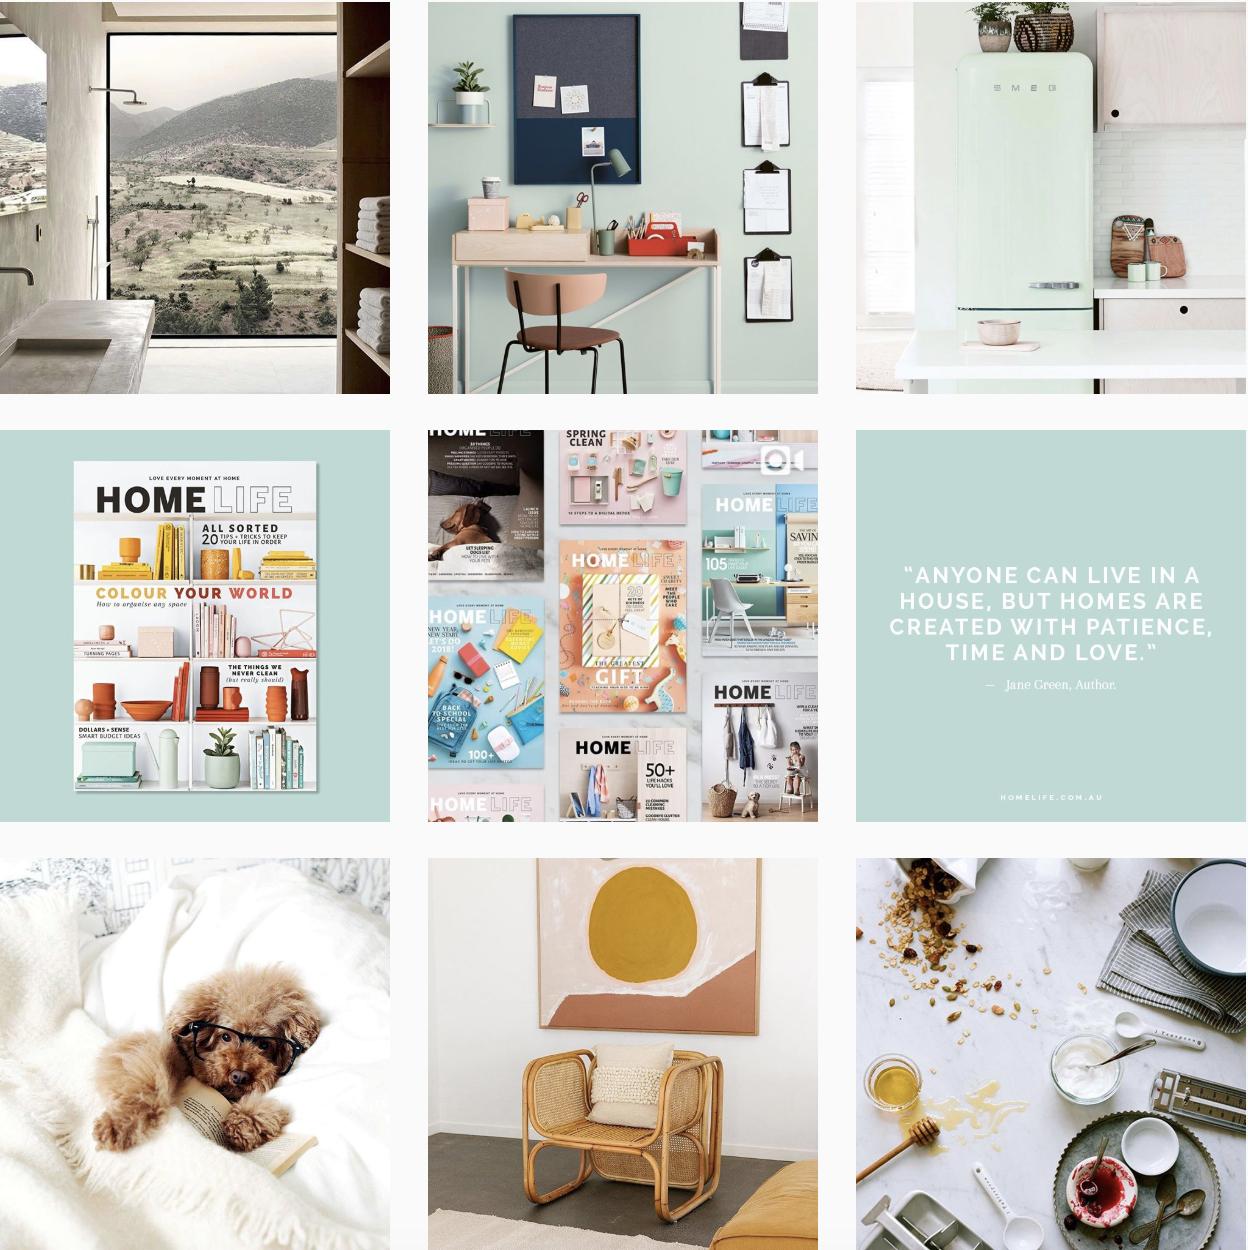 Homelife magazine Australia Instagram feed